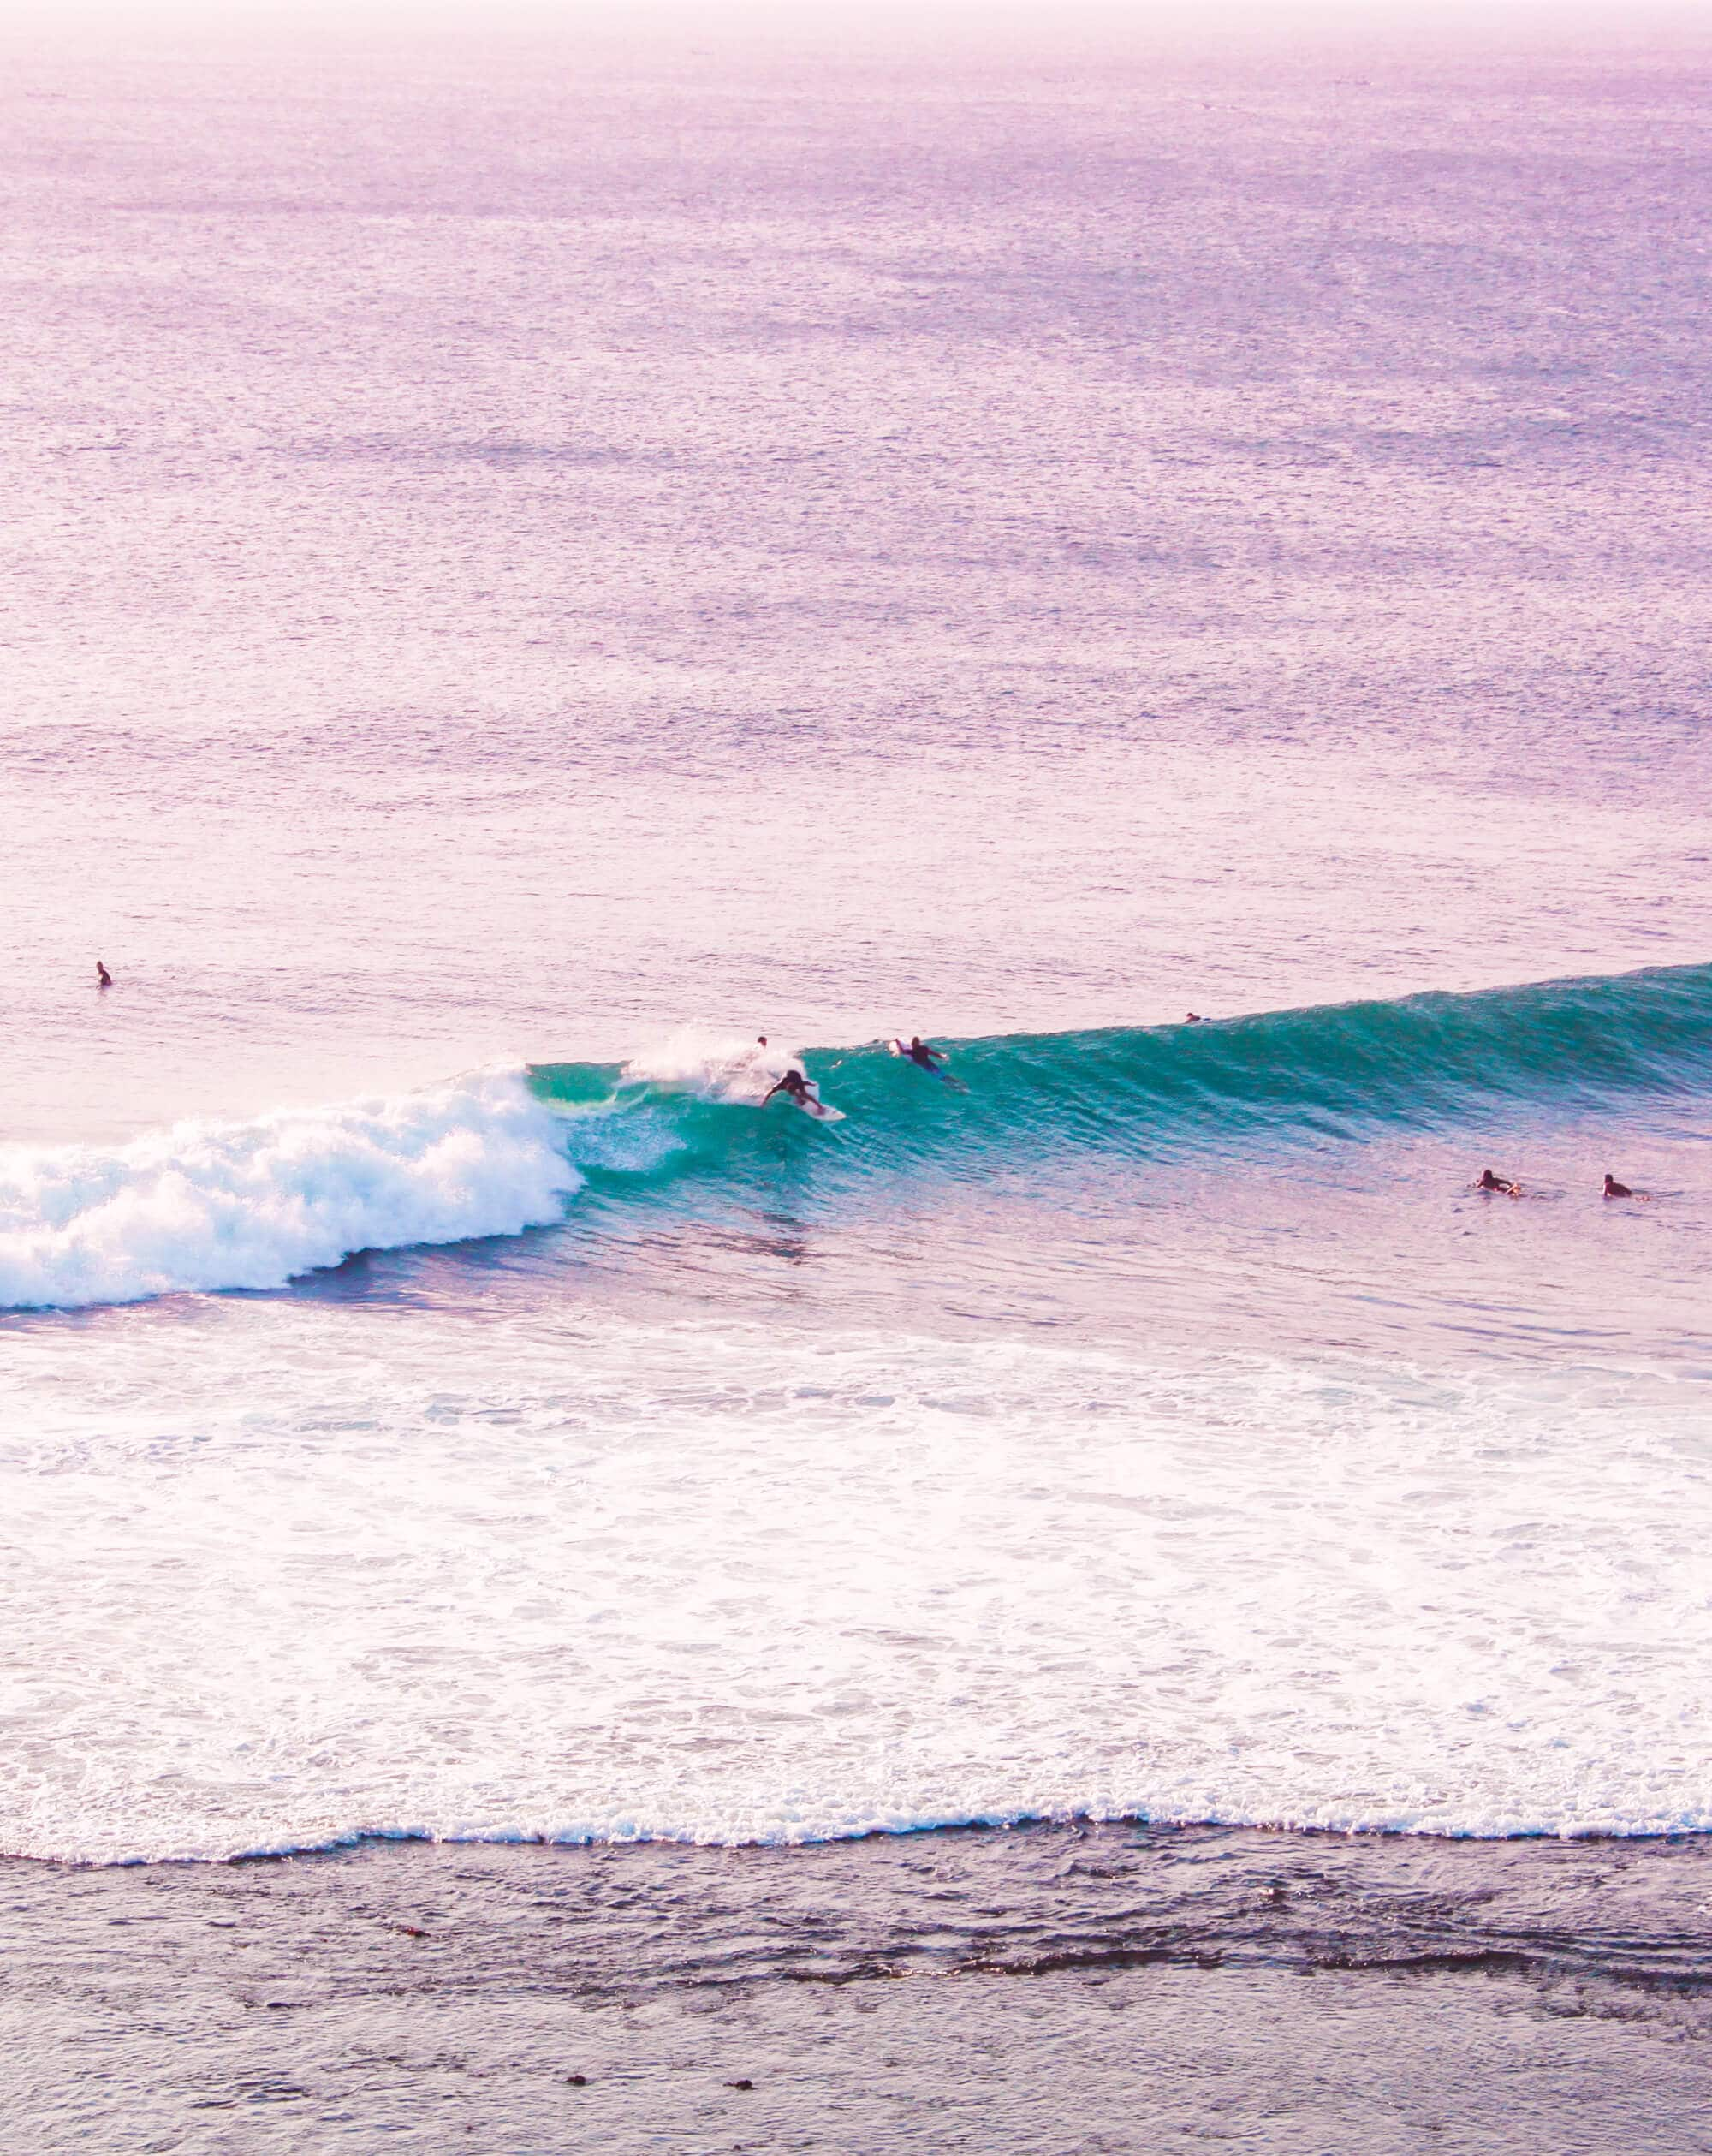 Island Life - Moving back to Bali & Lombok - Surfers in Uluwatu